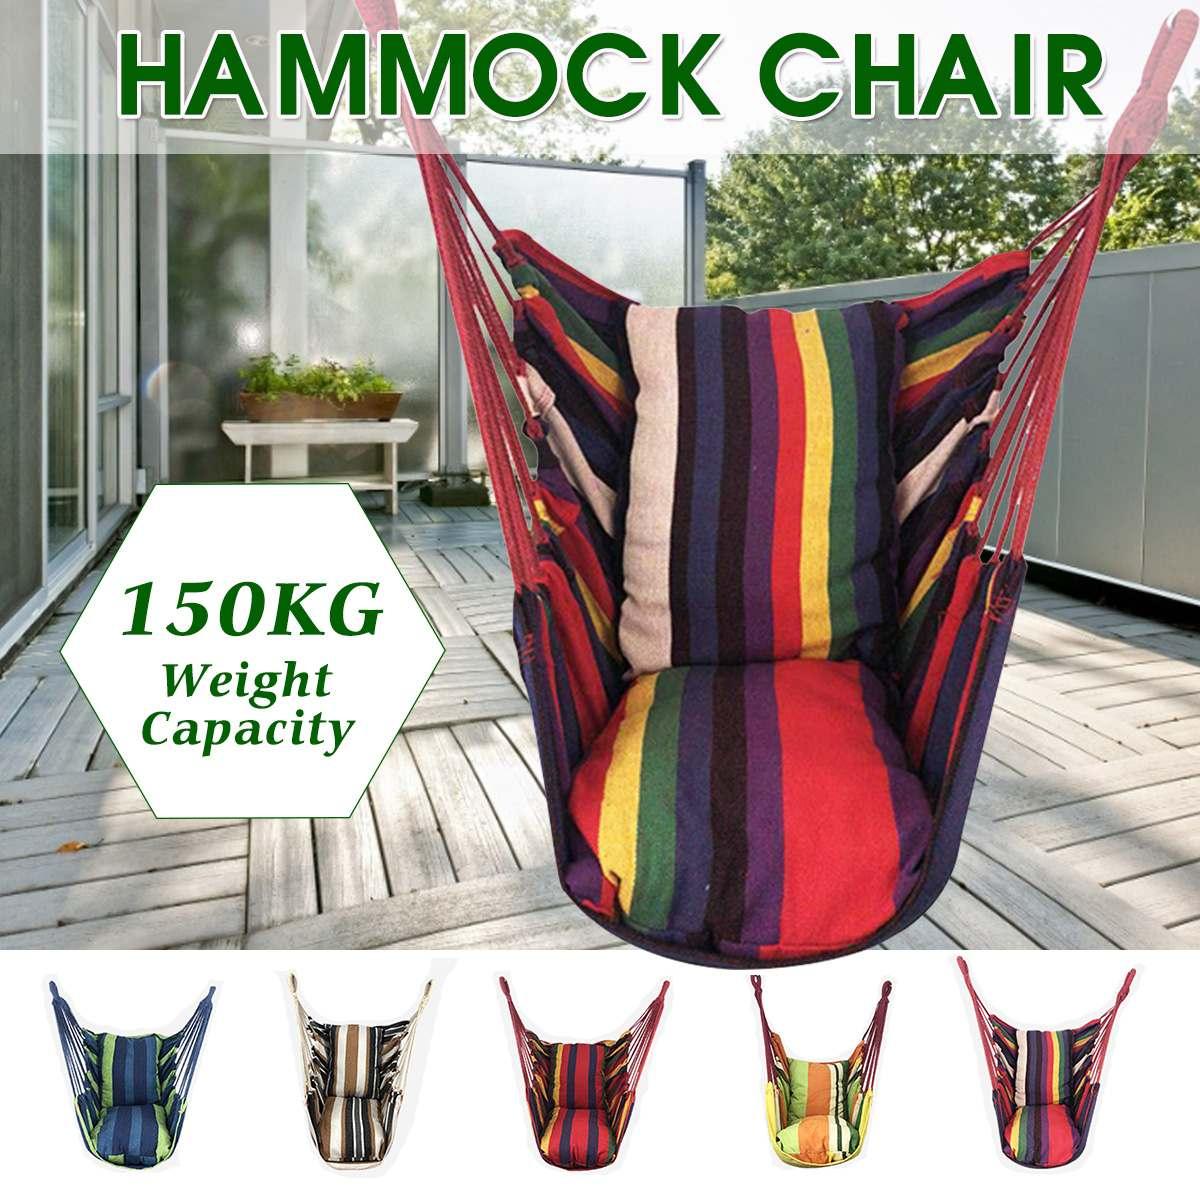 Hammock Chair Swing Chair Seat Travel Camping Hammock Outdoor Garden Adults Kids Hanging Chair Furniture Neck Hammock